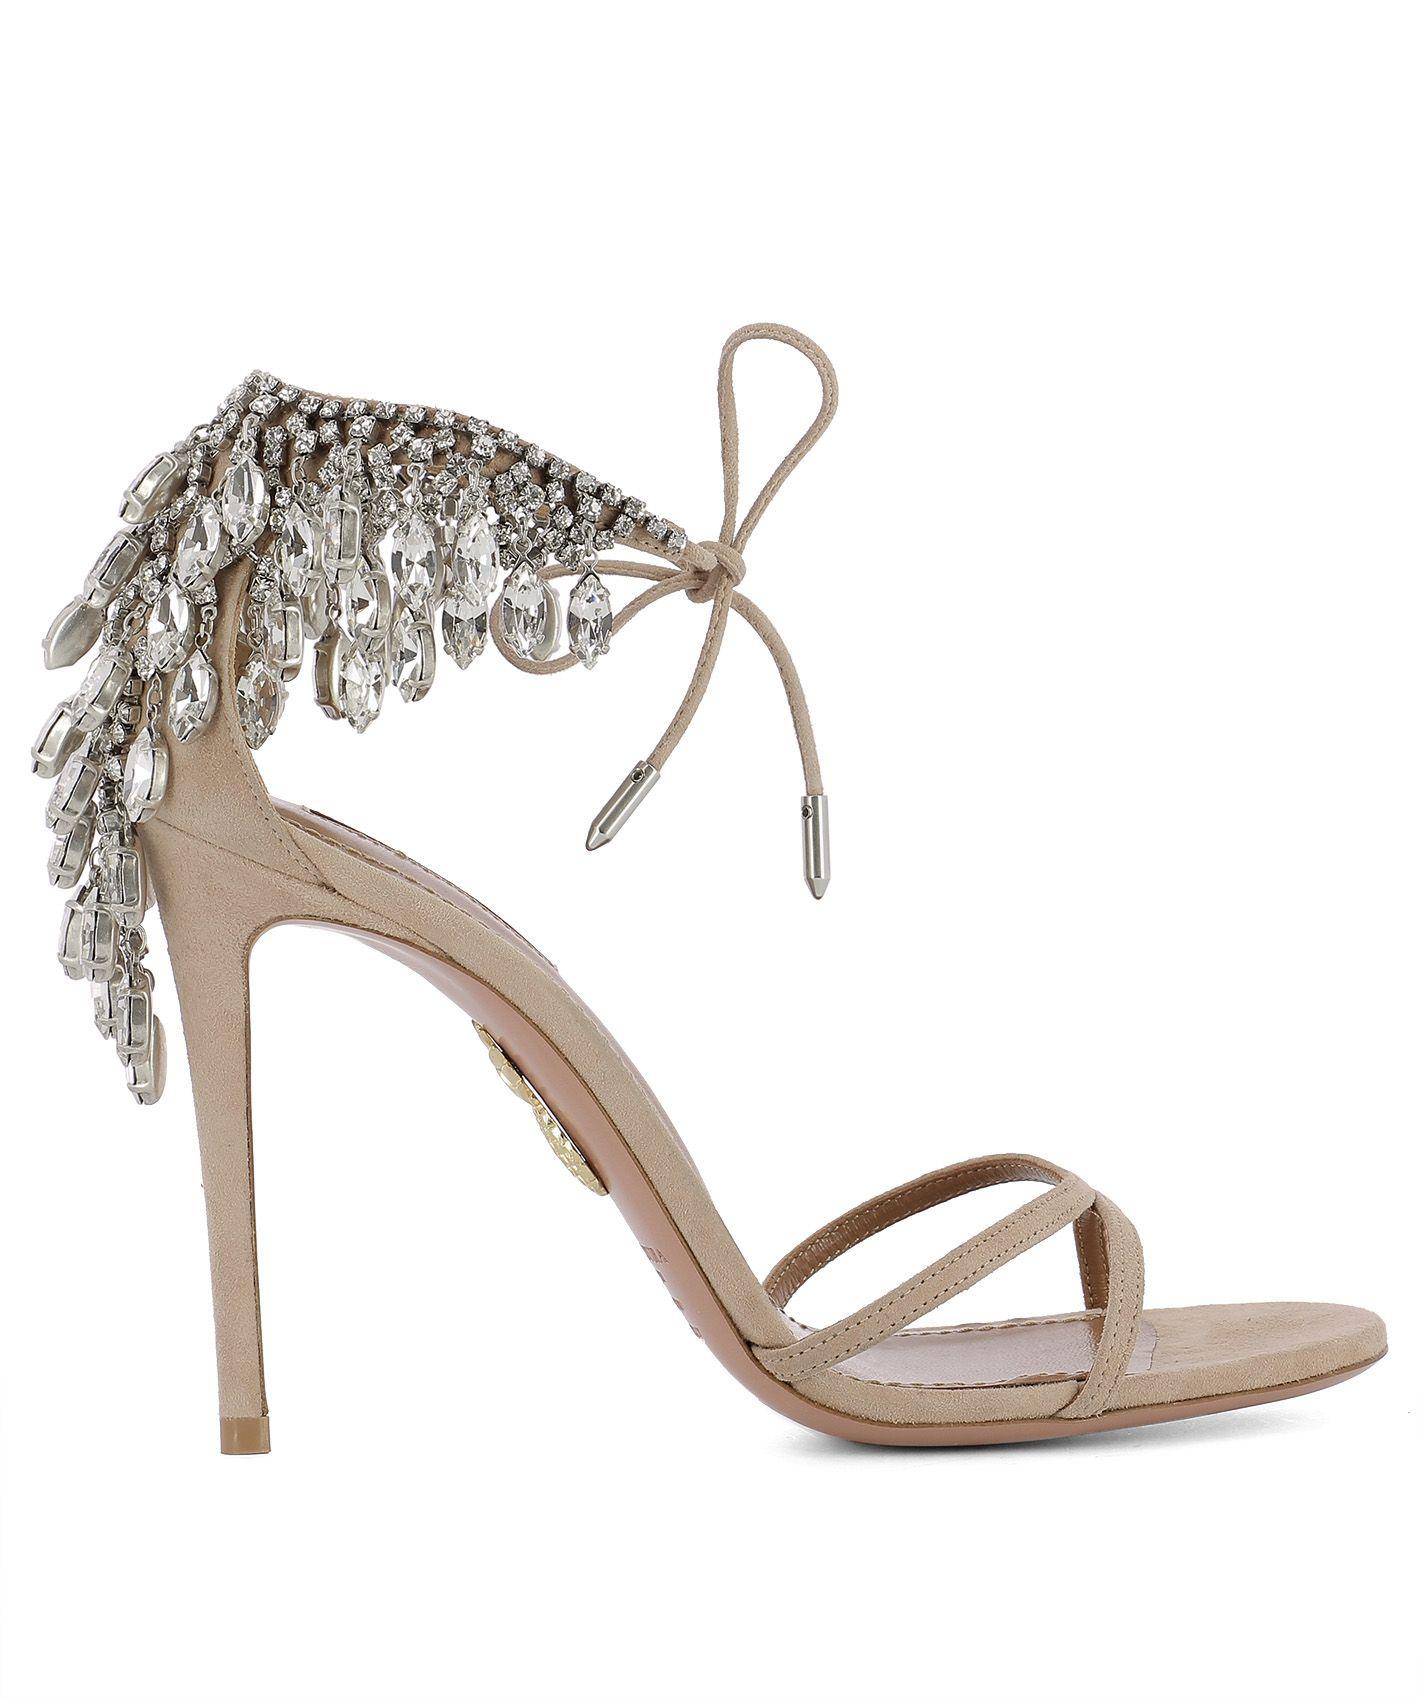 Pink Suede Sandal